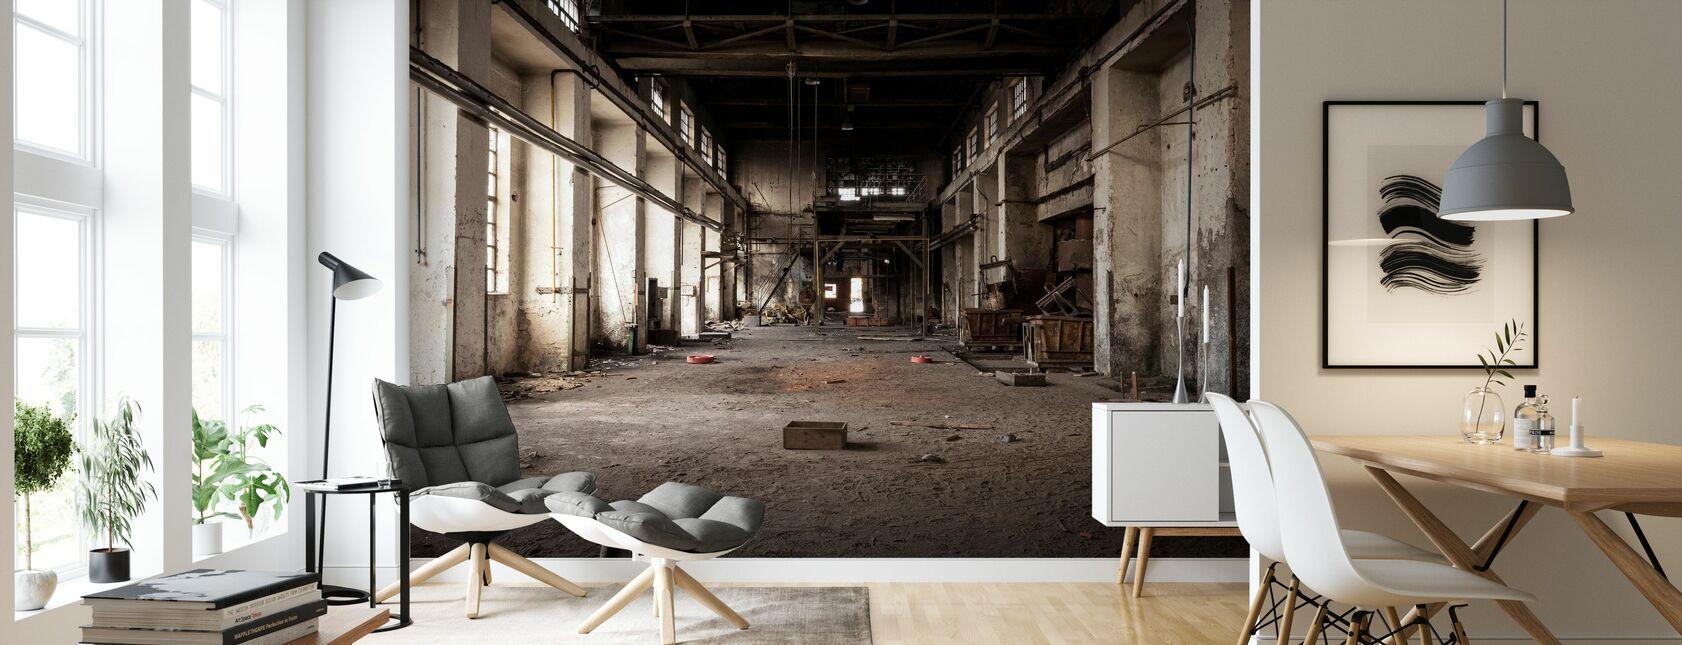 Gamle Industribygg - Tapet - Stue